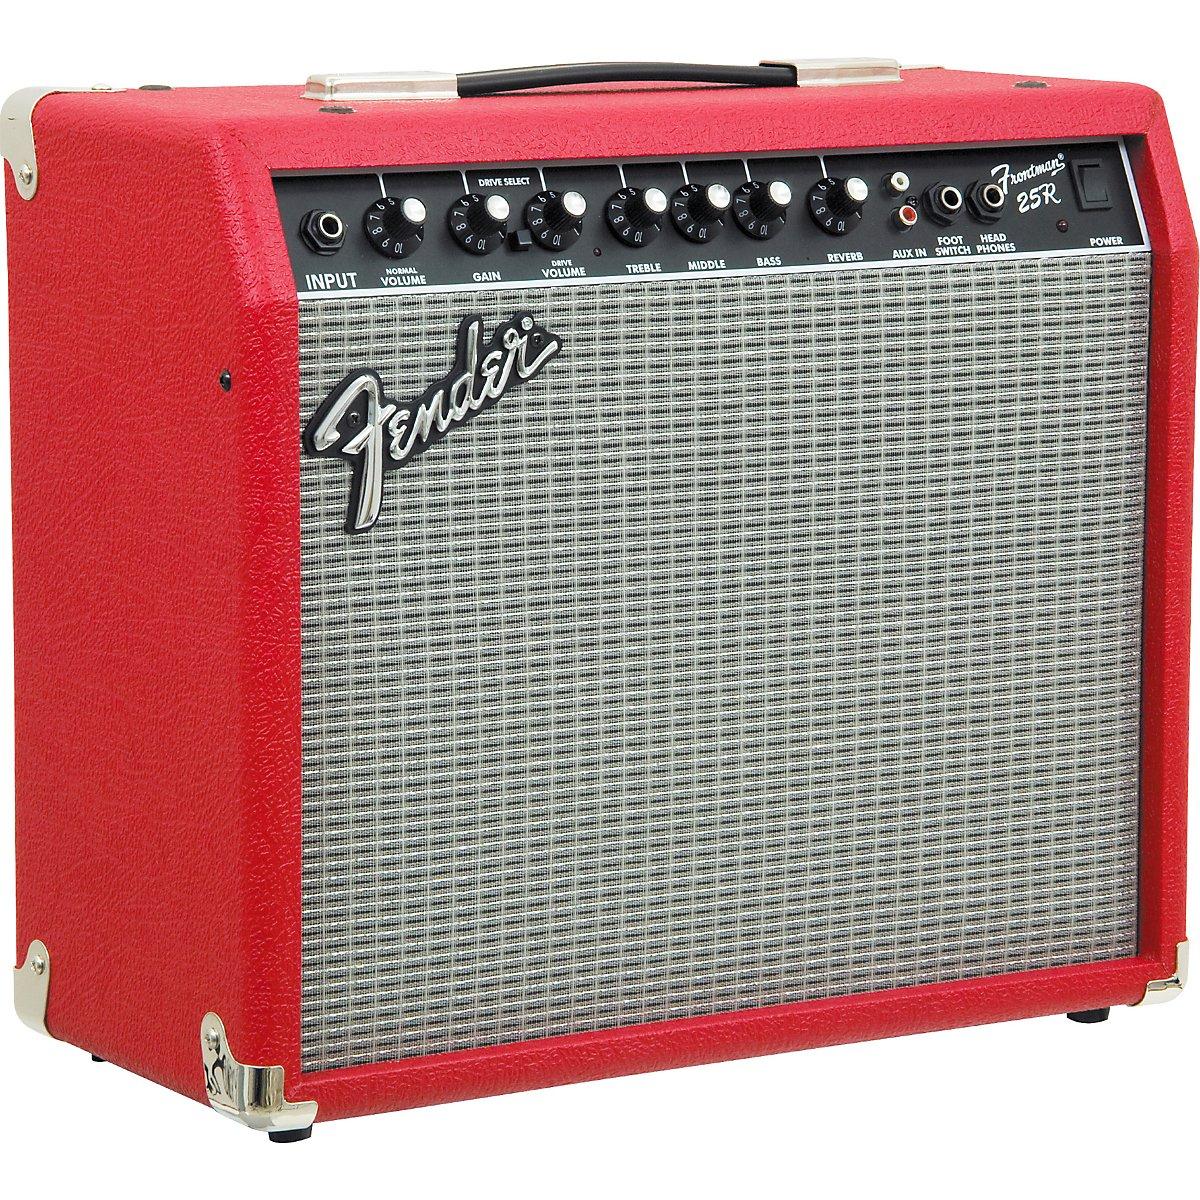 Fender 25r Frontman Series ii Amp Fender 25r Frontman Series ii